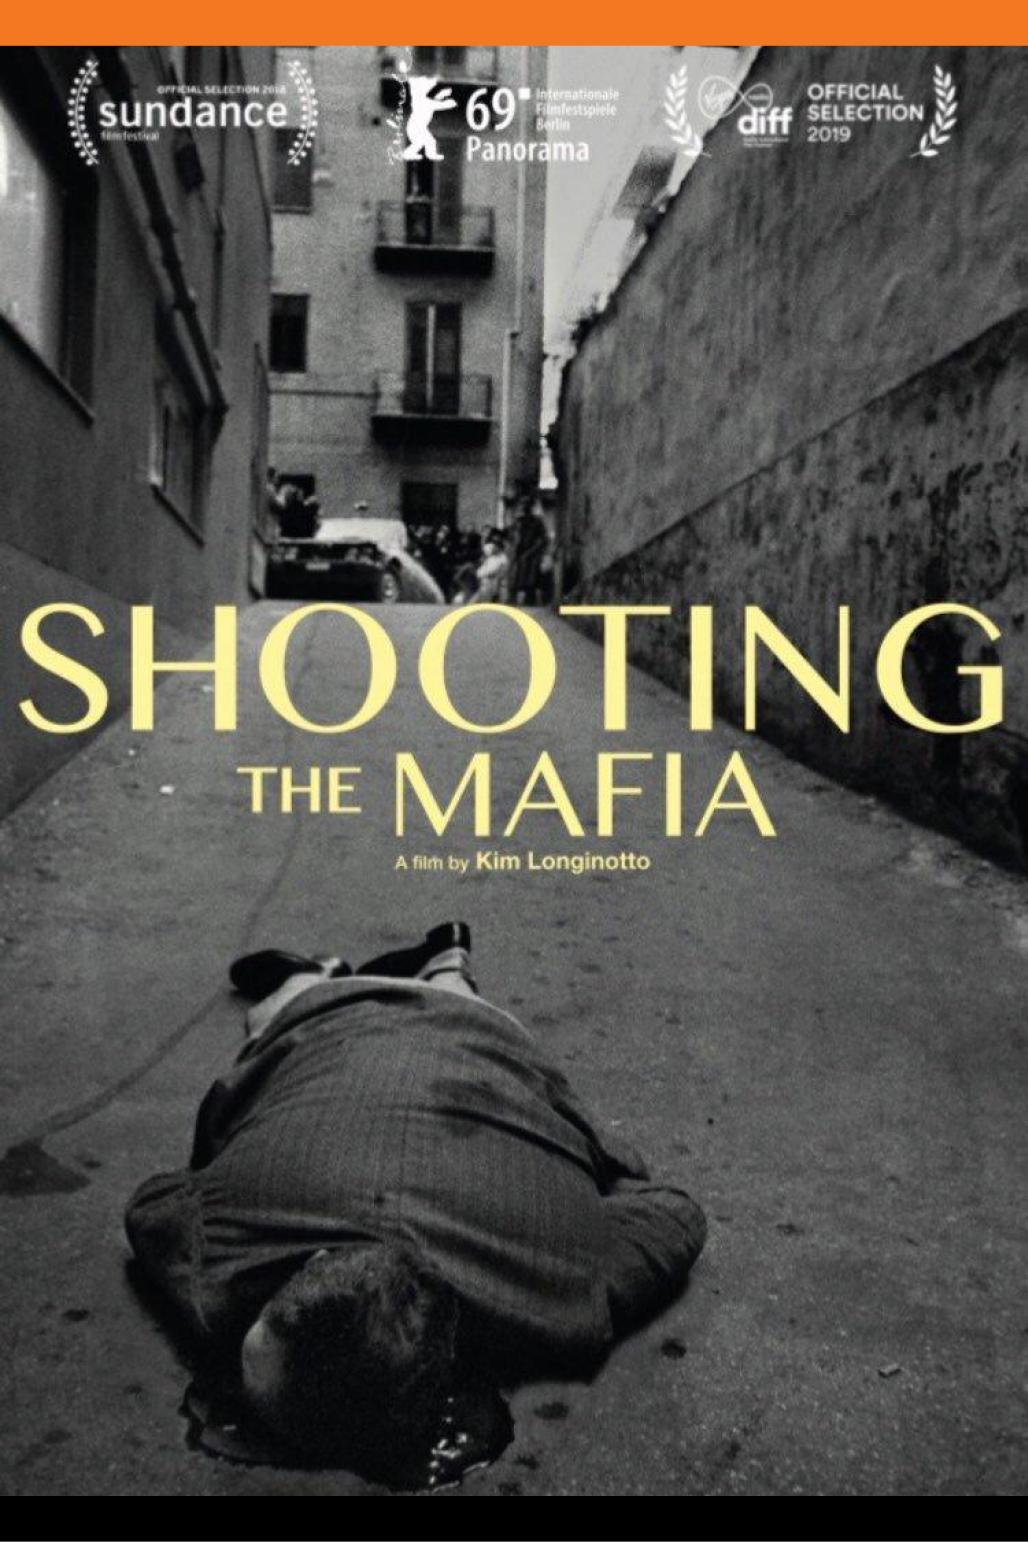 EAD02 - Stronger Than Fiction Material_Dendy_Website Movie Thumbnails_Shooting the Mafia - Copy.jpg